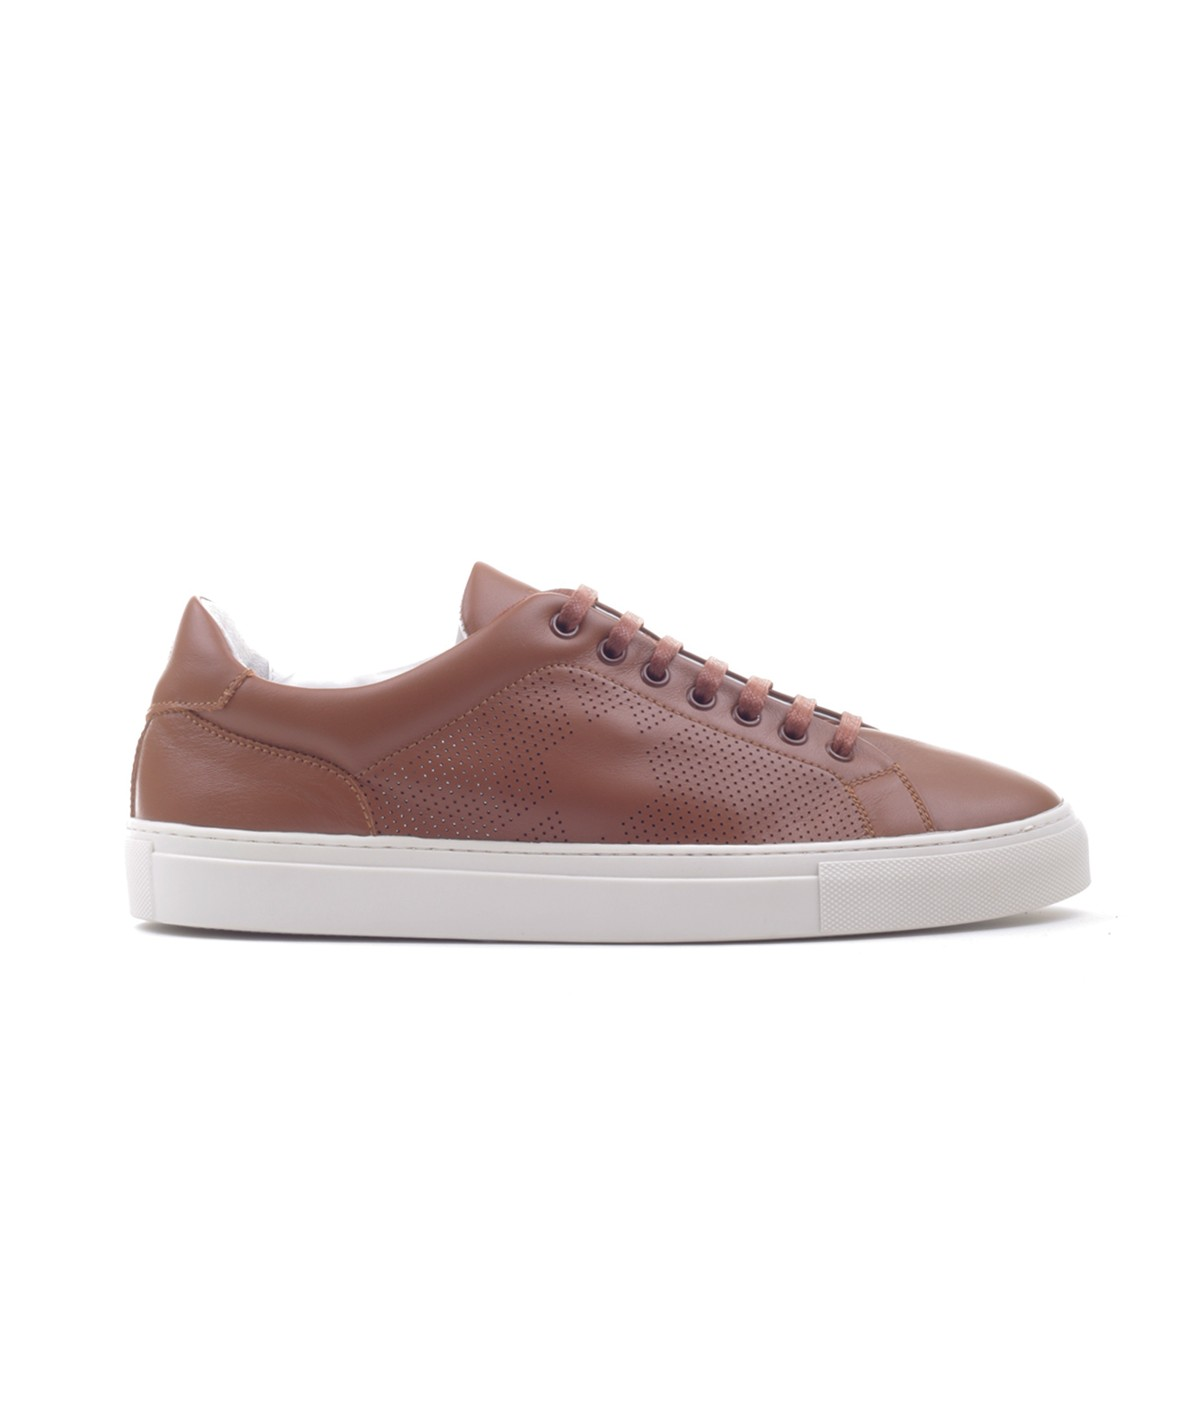 BALLANTYNE Sneakers Uomo